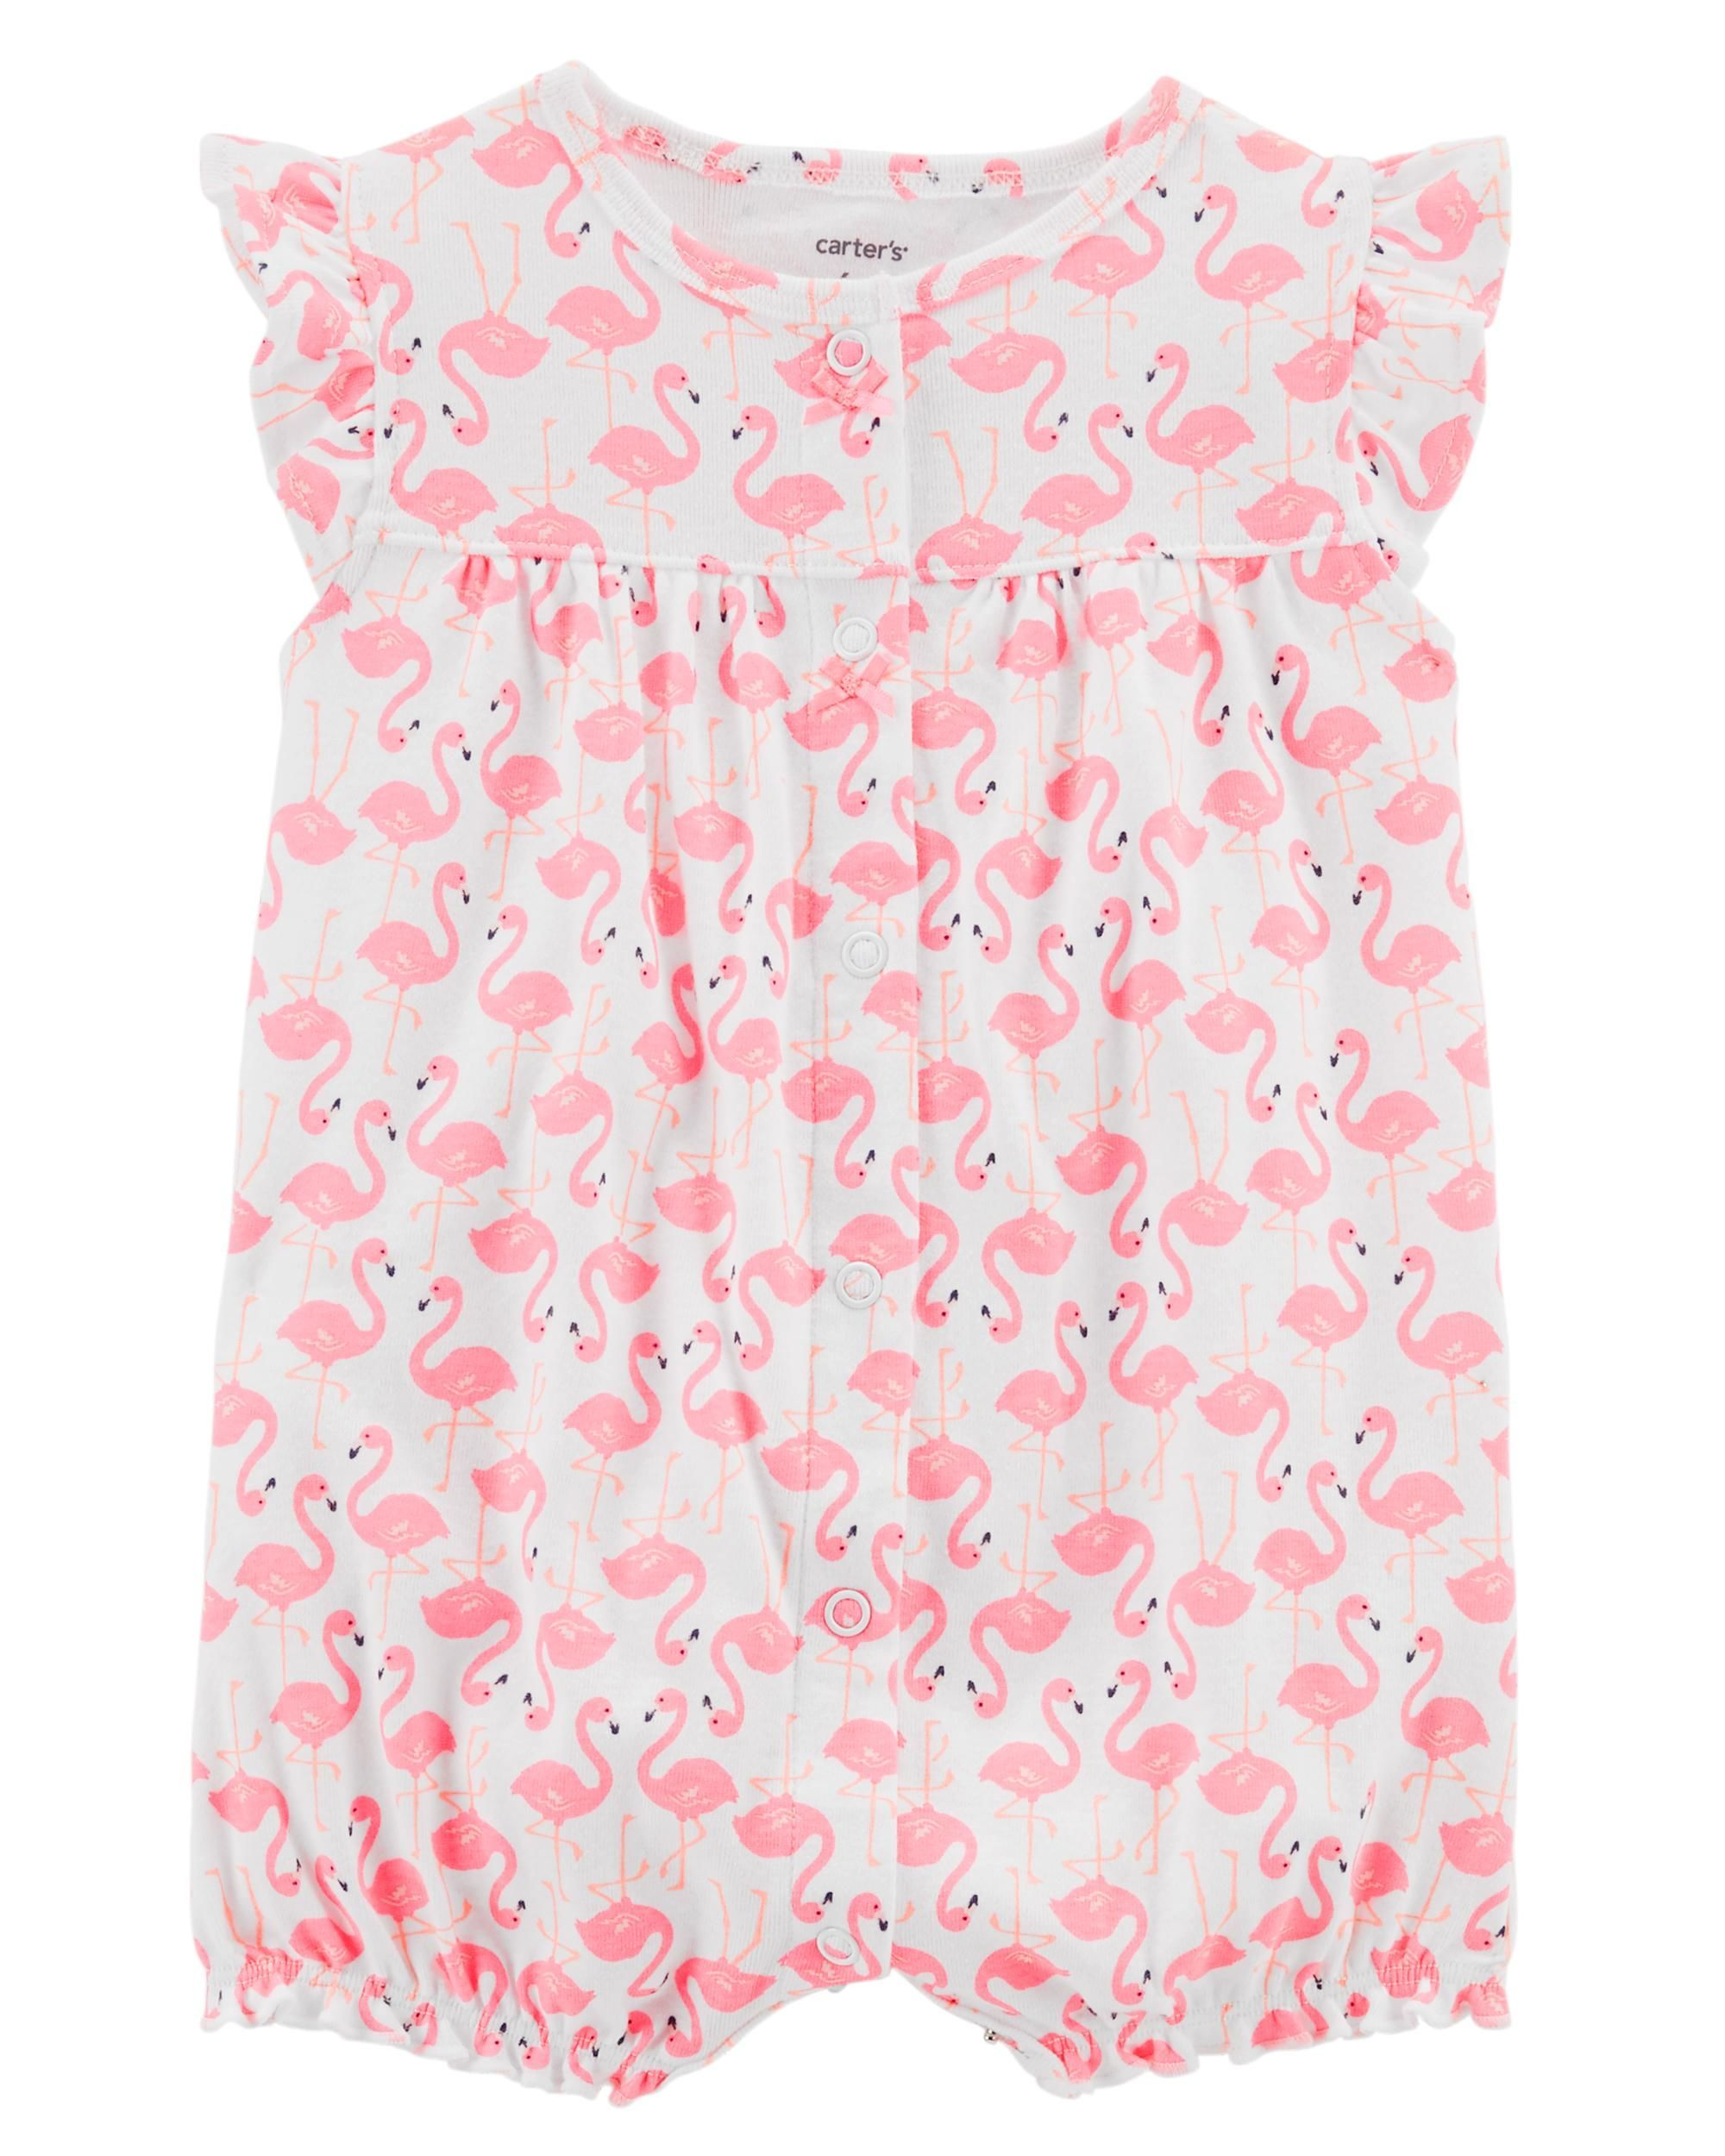 255baa40a0c5 Flamingo Snap-Up Cotton Romper